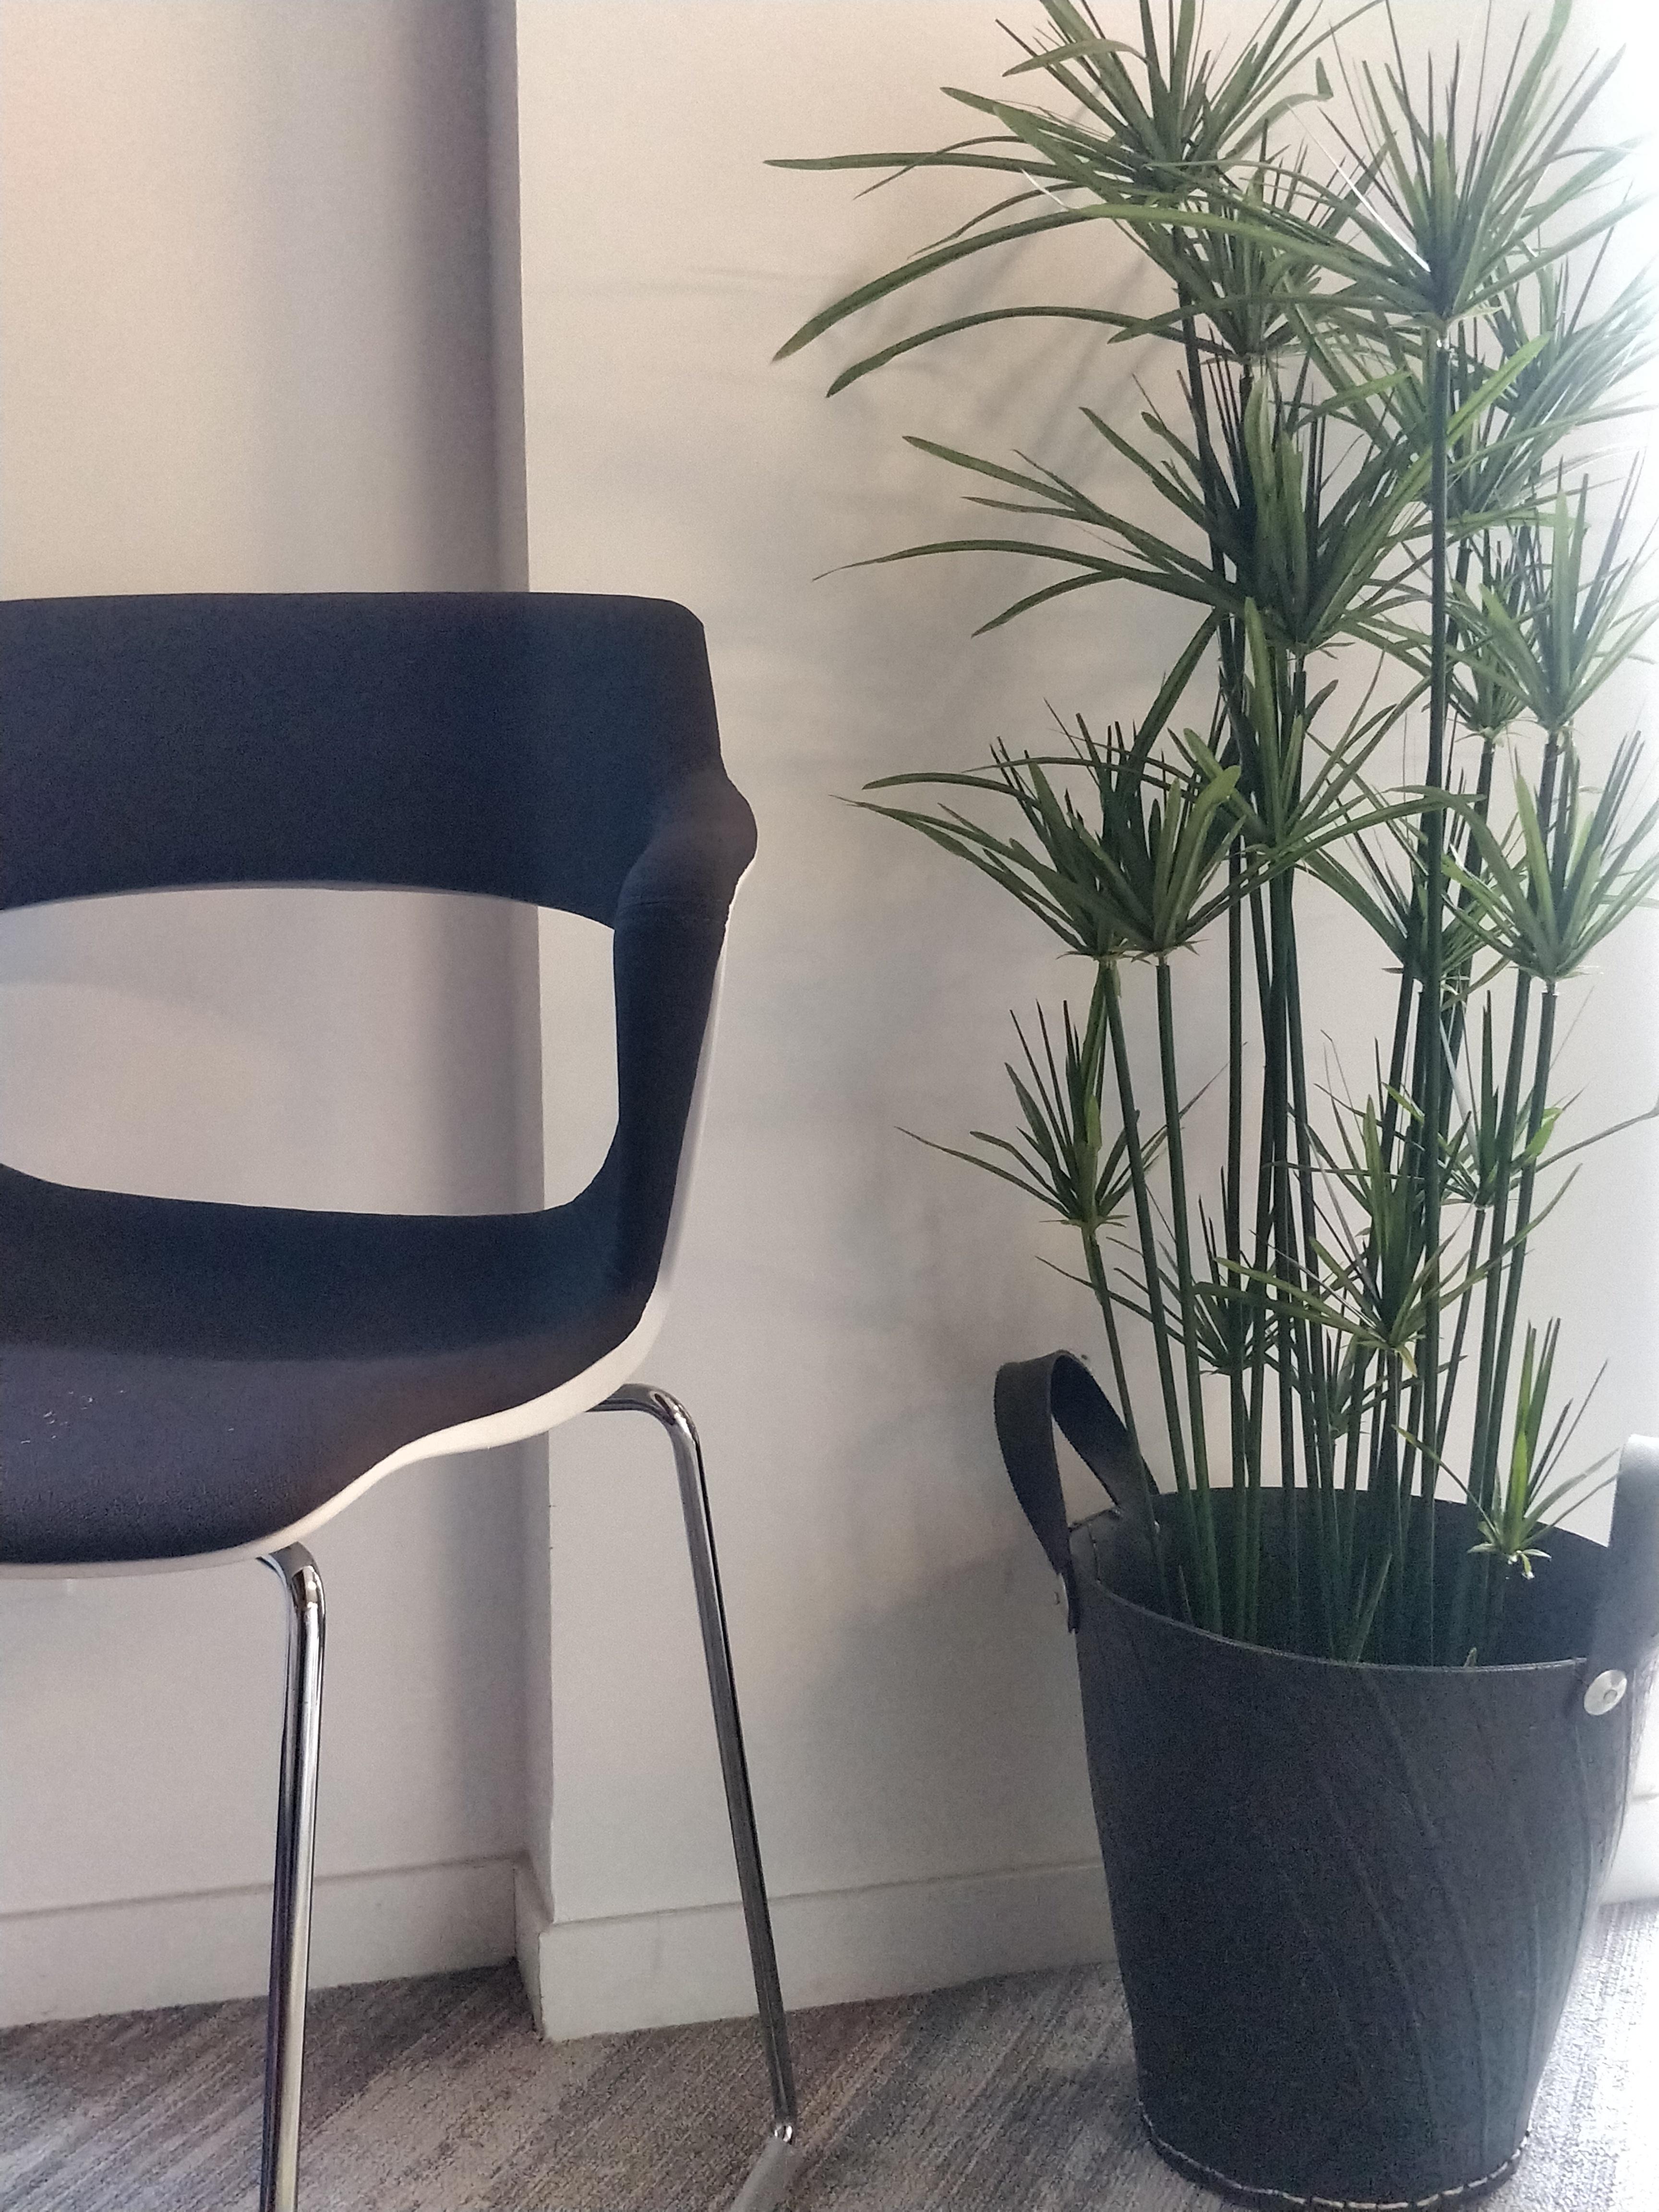 plante decoration bureau accessoire (1)